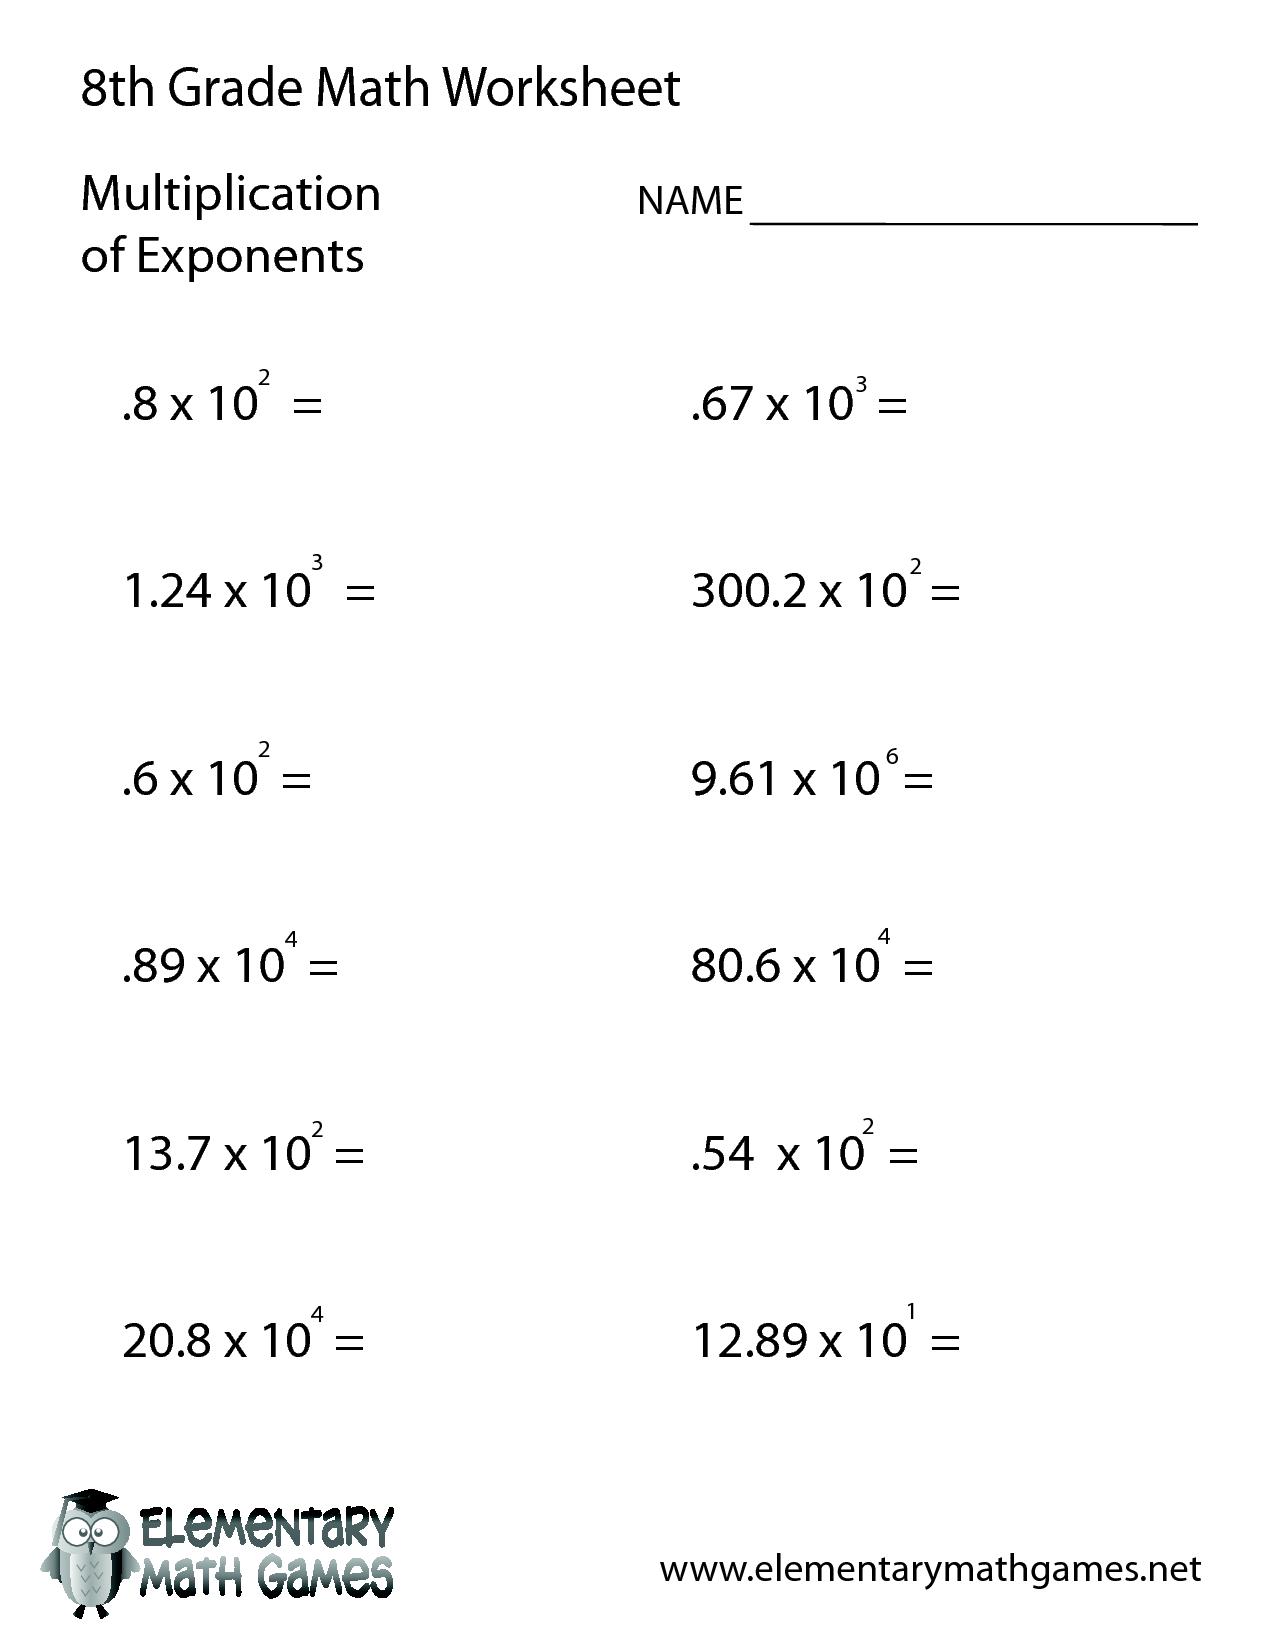 8th Grade Math Problems Practice